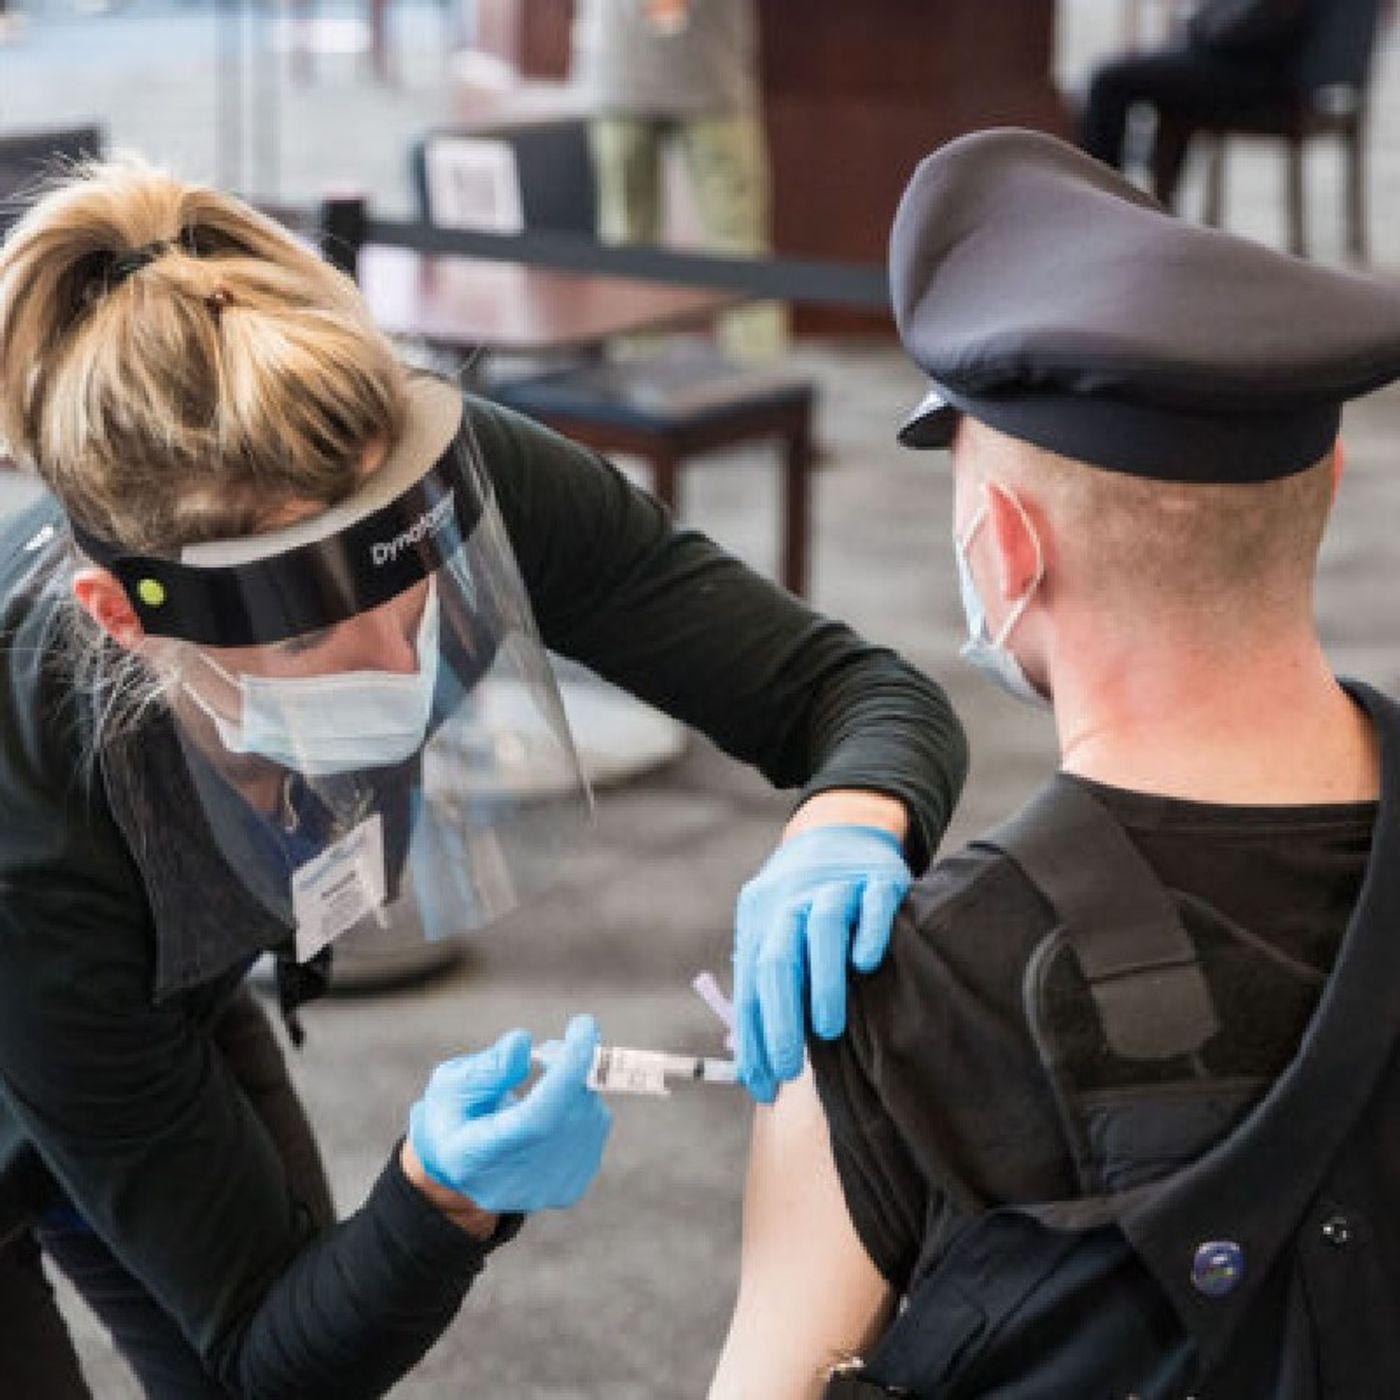 Episode 1392 - Judge Denies Police Union's Effort to Delay Vaccine Mandate in Massachusetts